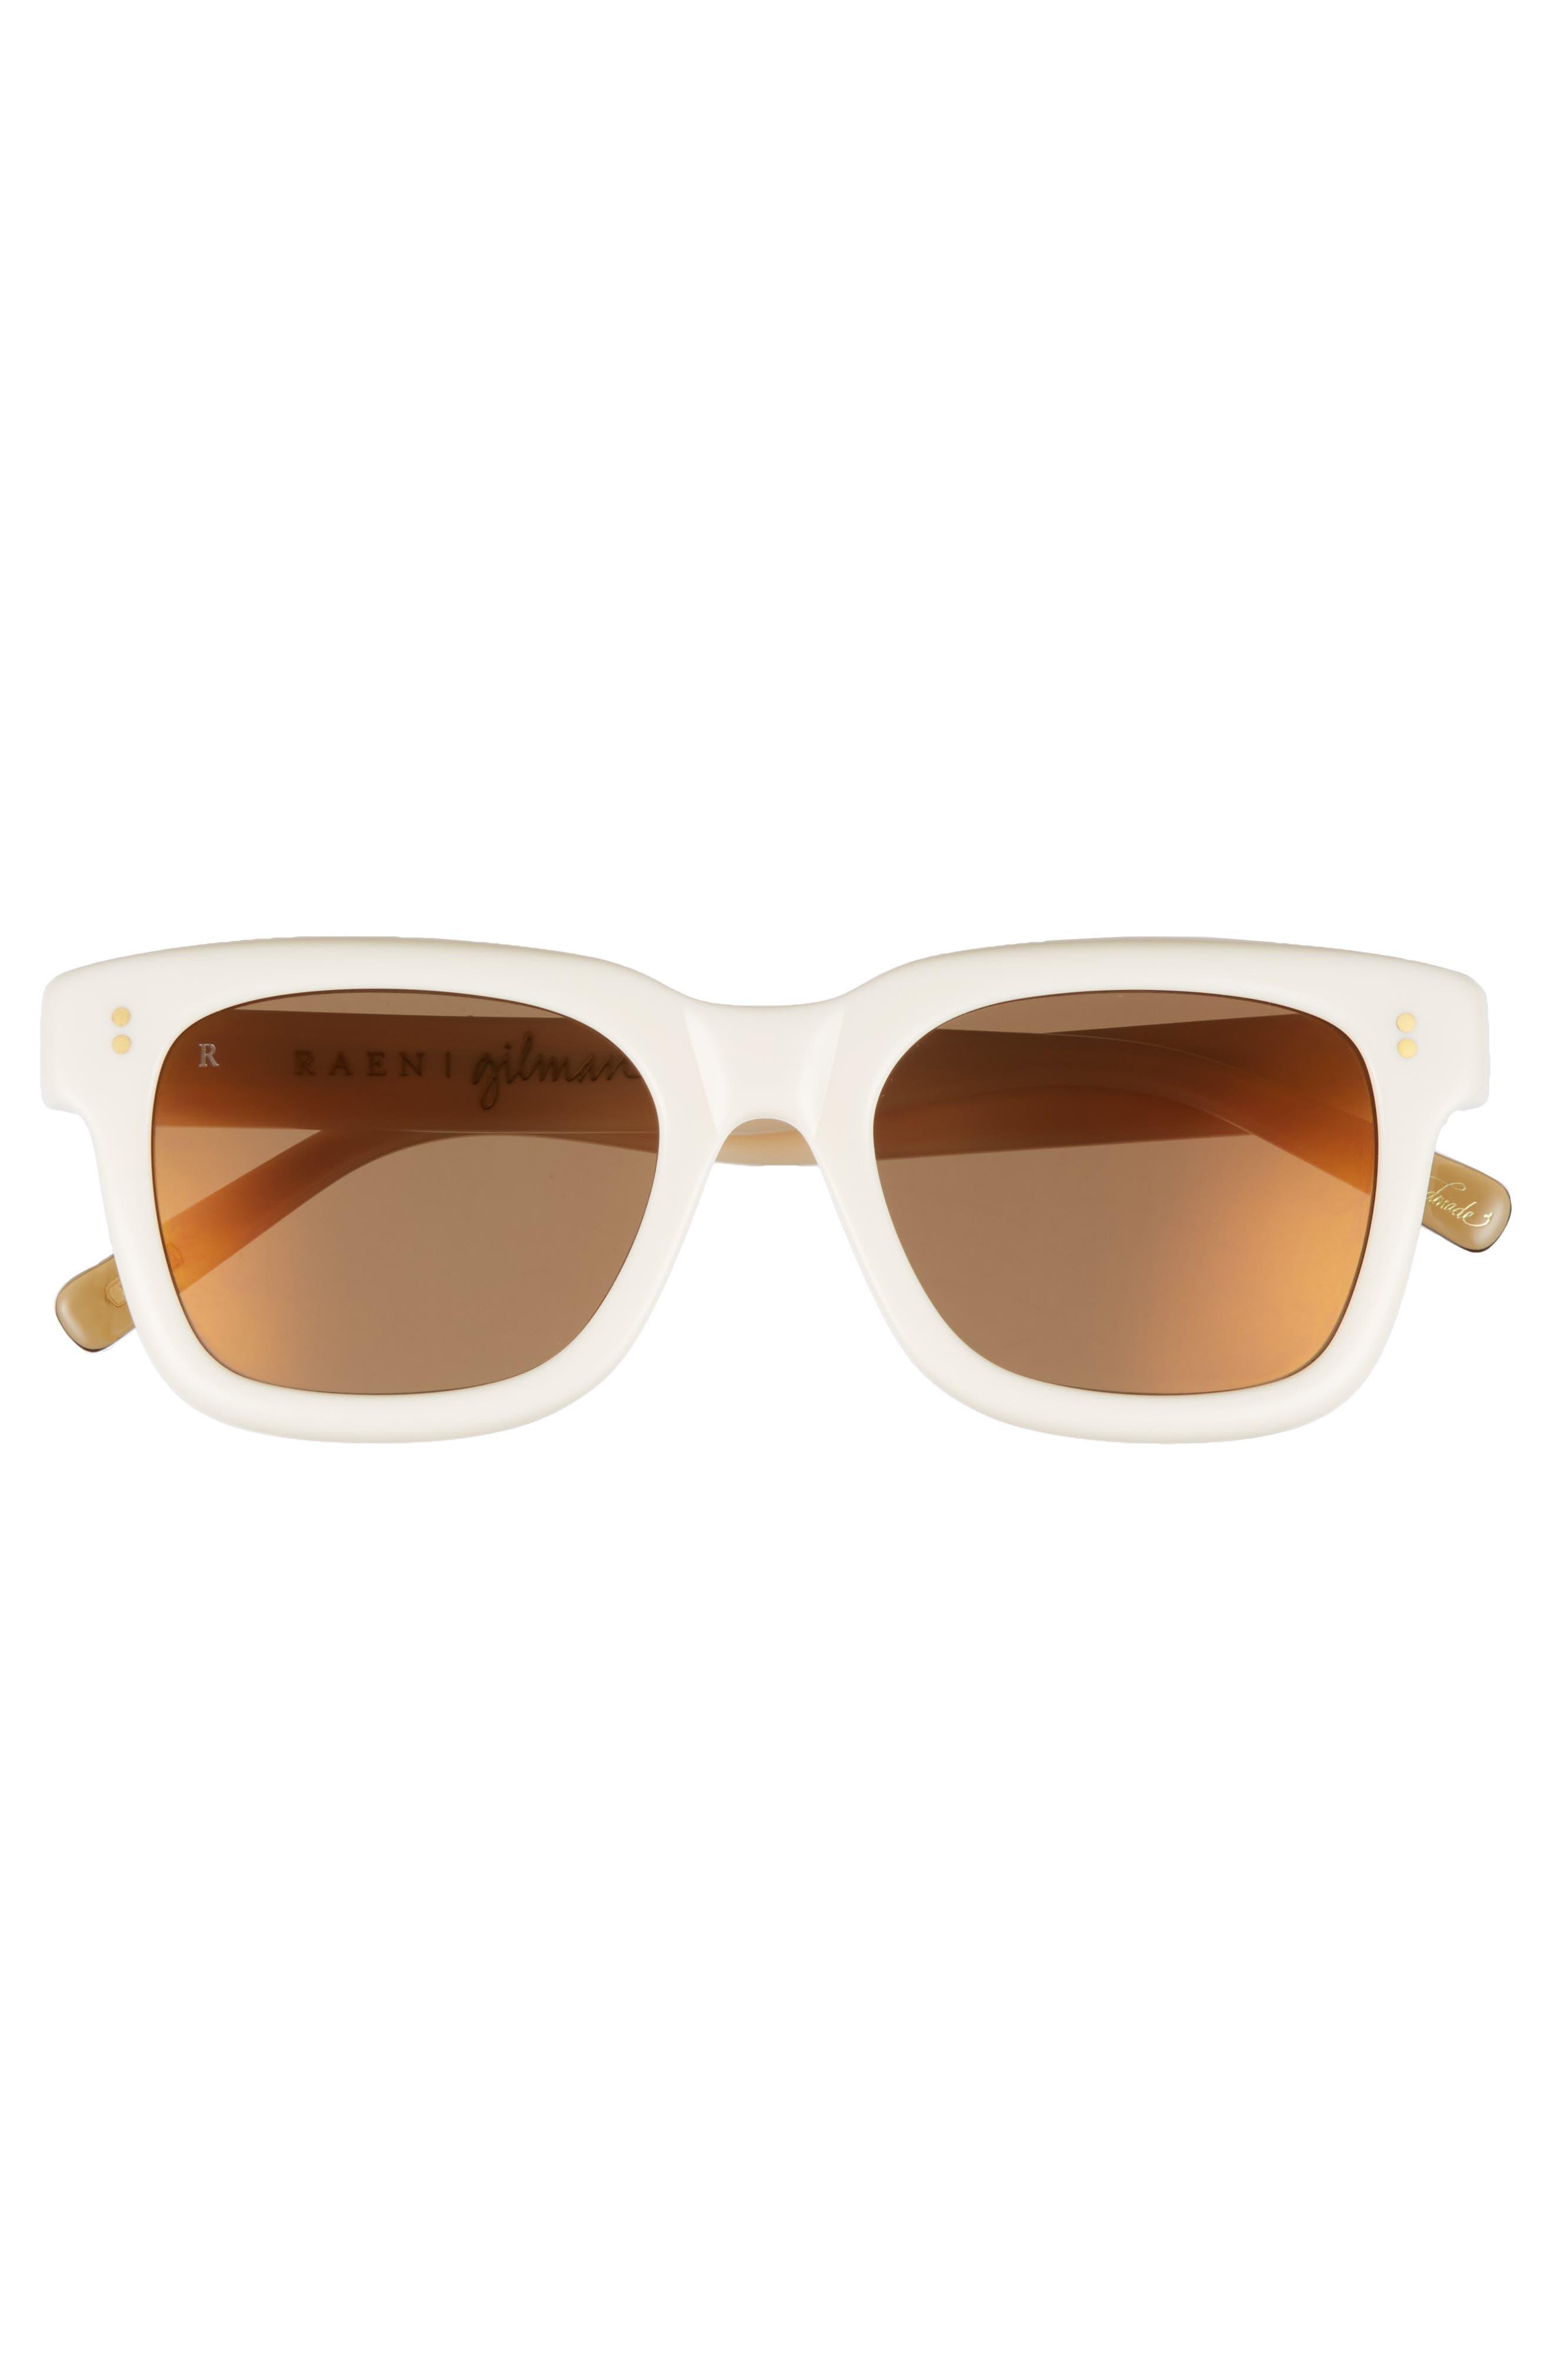 Gilman 52mm Mirrored Polarized Sunglasses,                             Alternate thumbnail 2, color,                             650